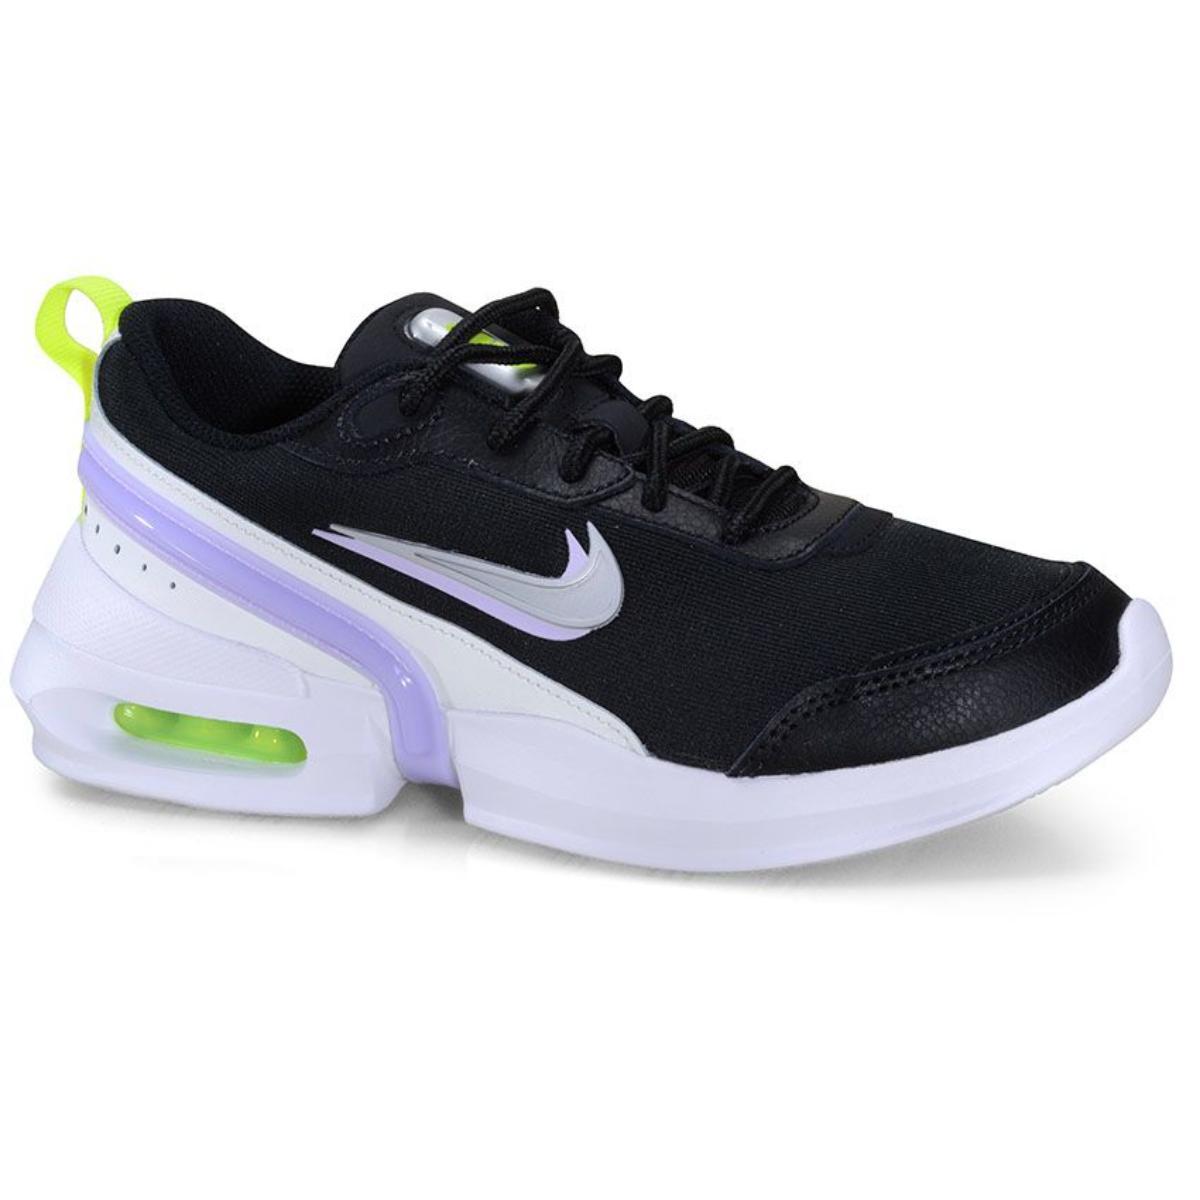 Tênis Feminino Nike Cj1678-001 Air Max Siren Preto/branco